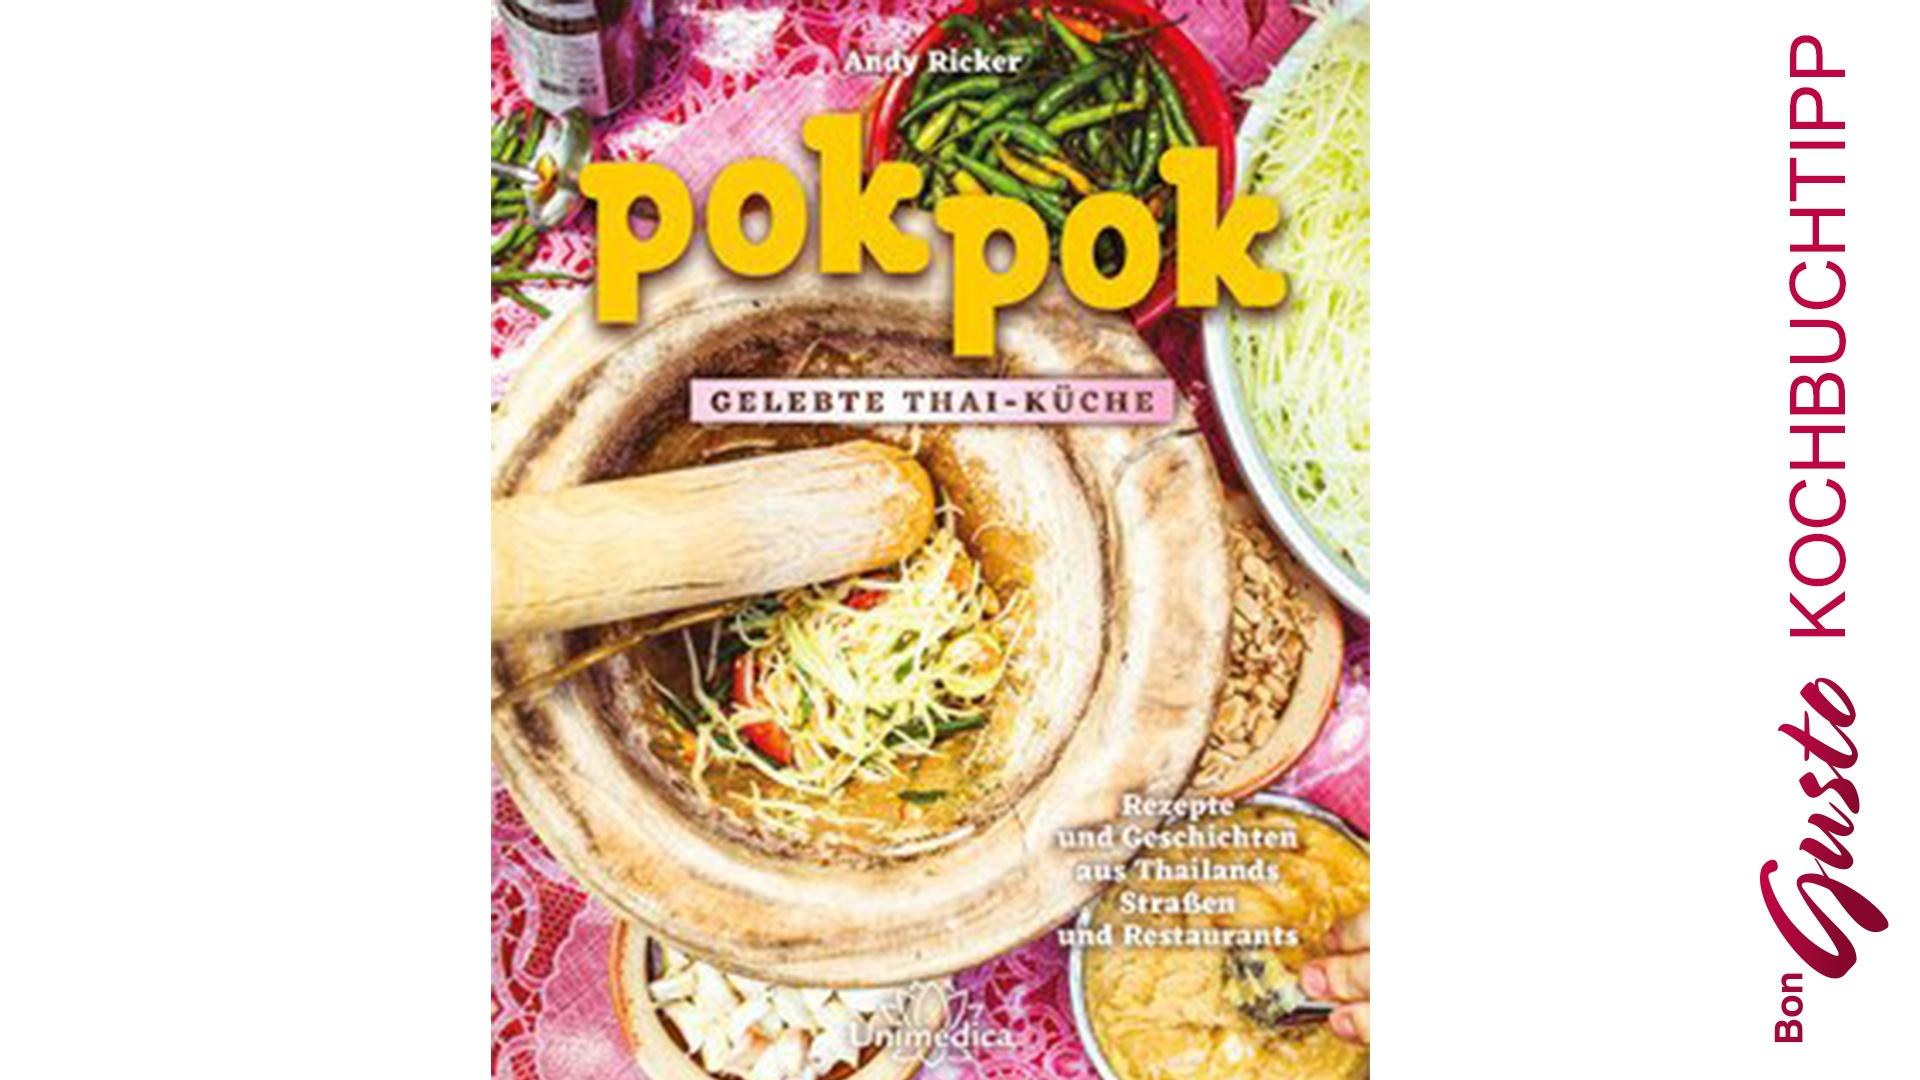 BonGusto Kochbuchtipp: Pok Pok gelebte Thai-Küche